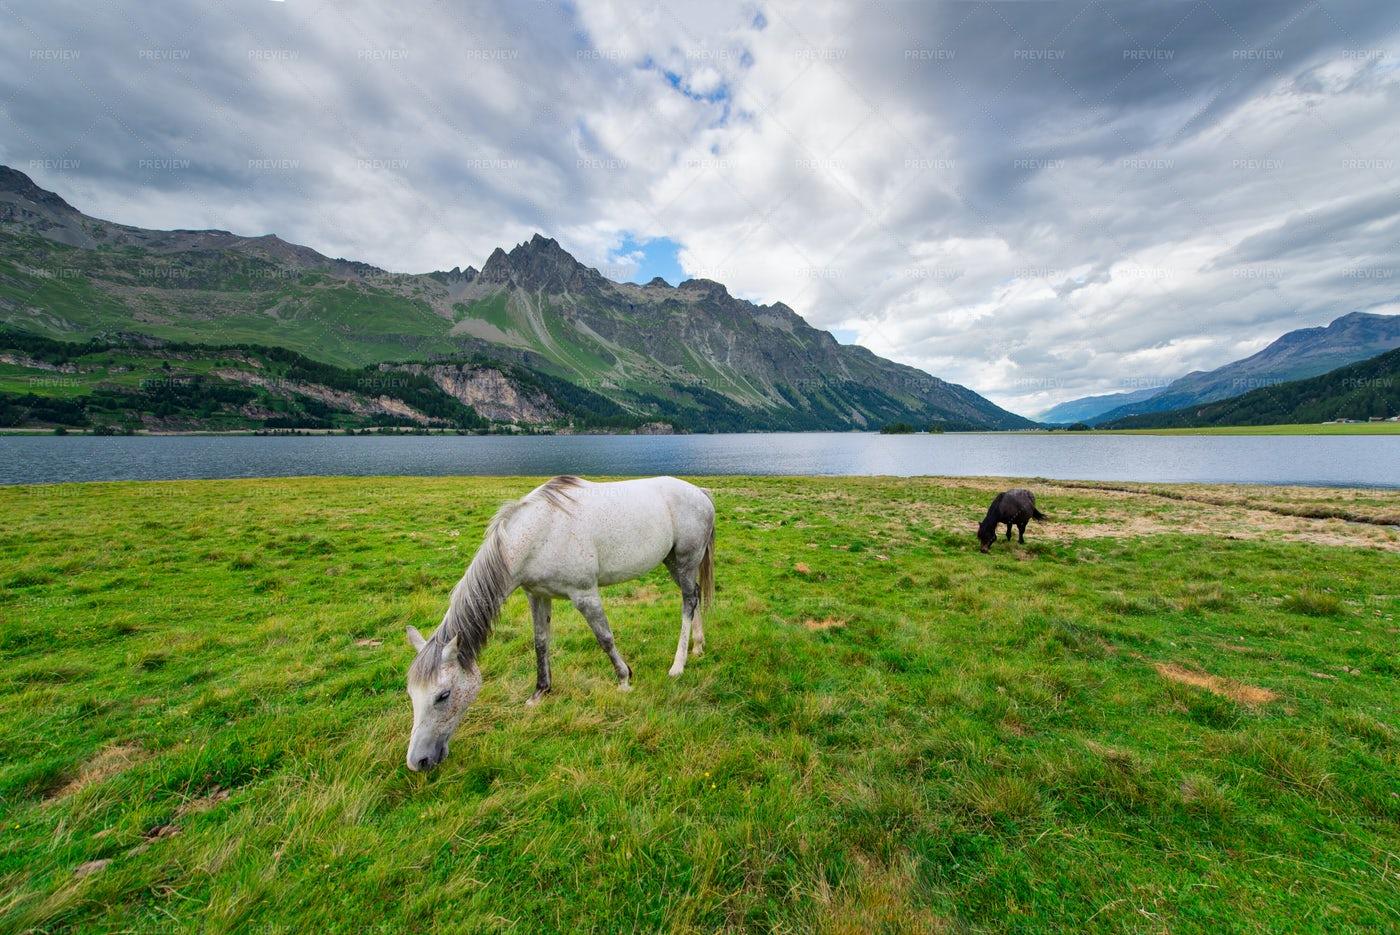 Horses Near A Lake In The Mountains: Stock Photos